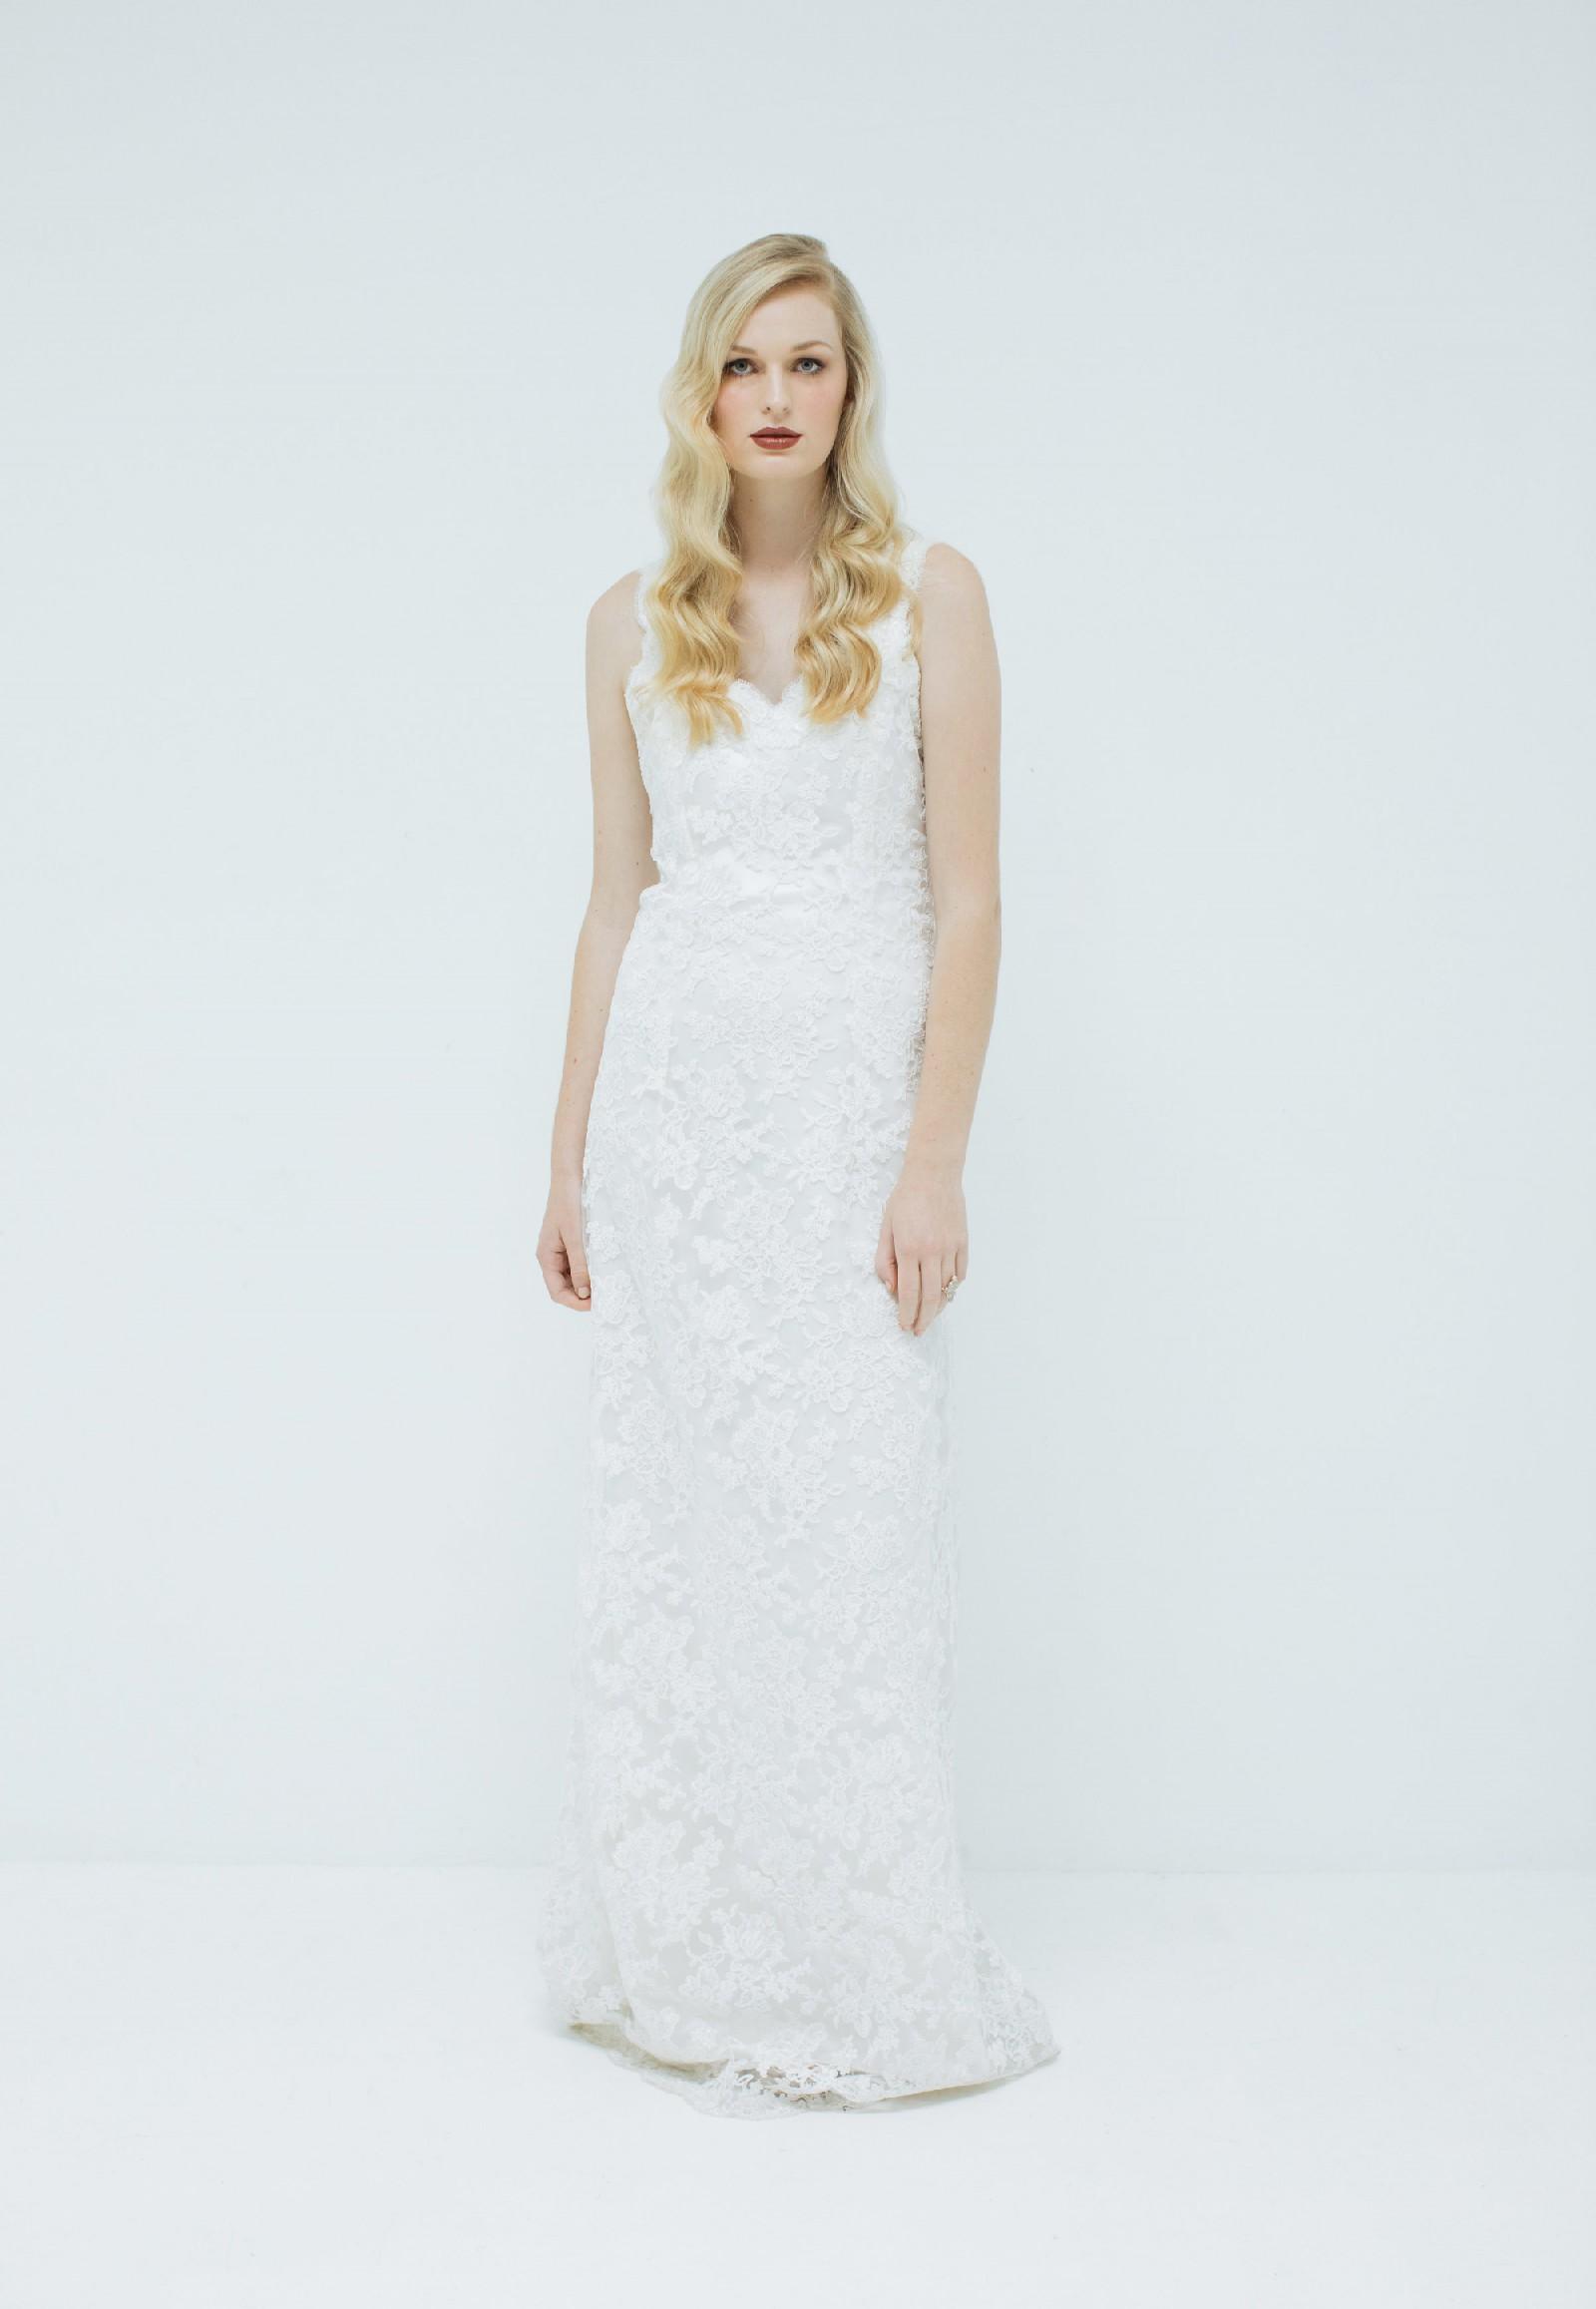 Wedding Dress Sample Sale.Wedding Dress Sample Sale Auckland Saddha